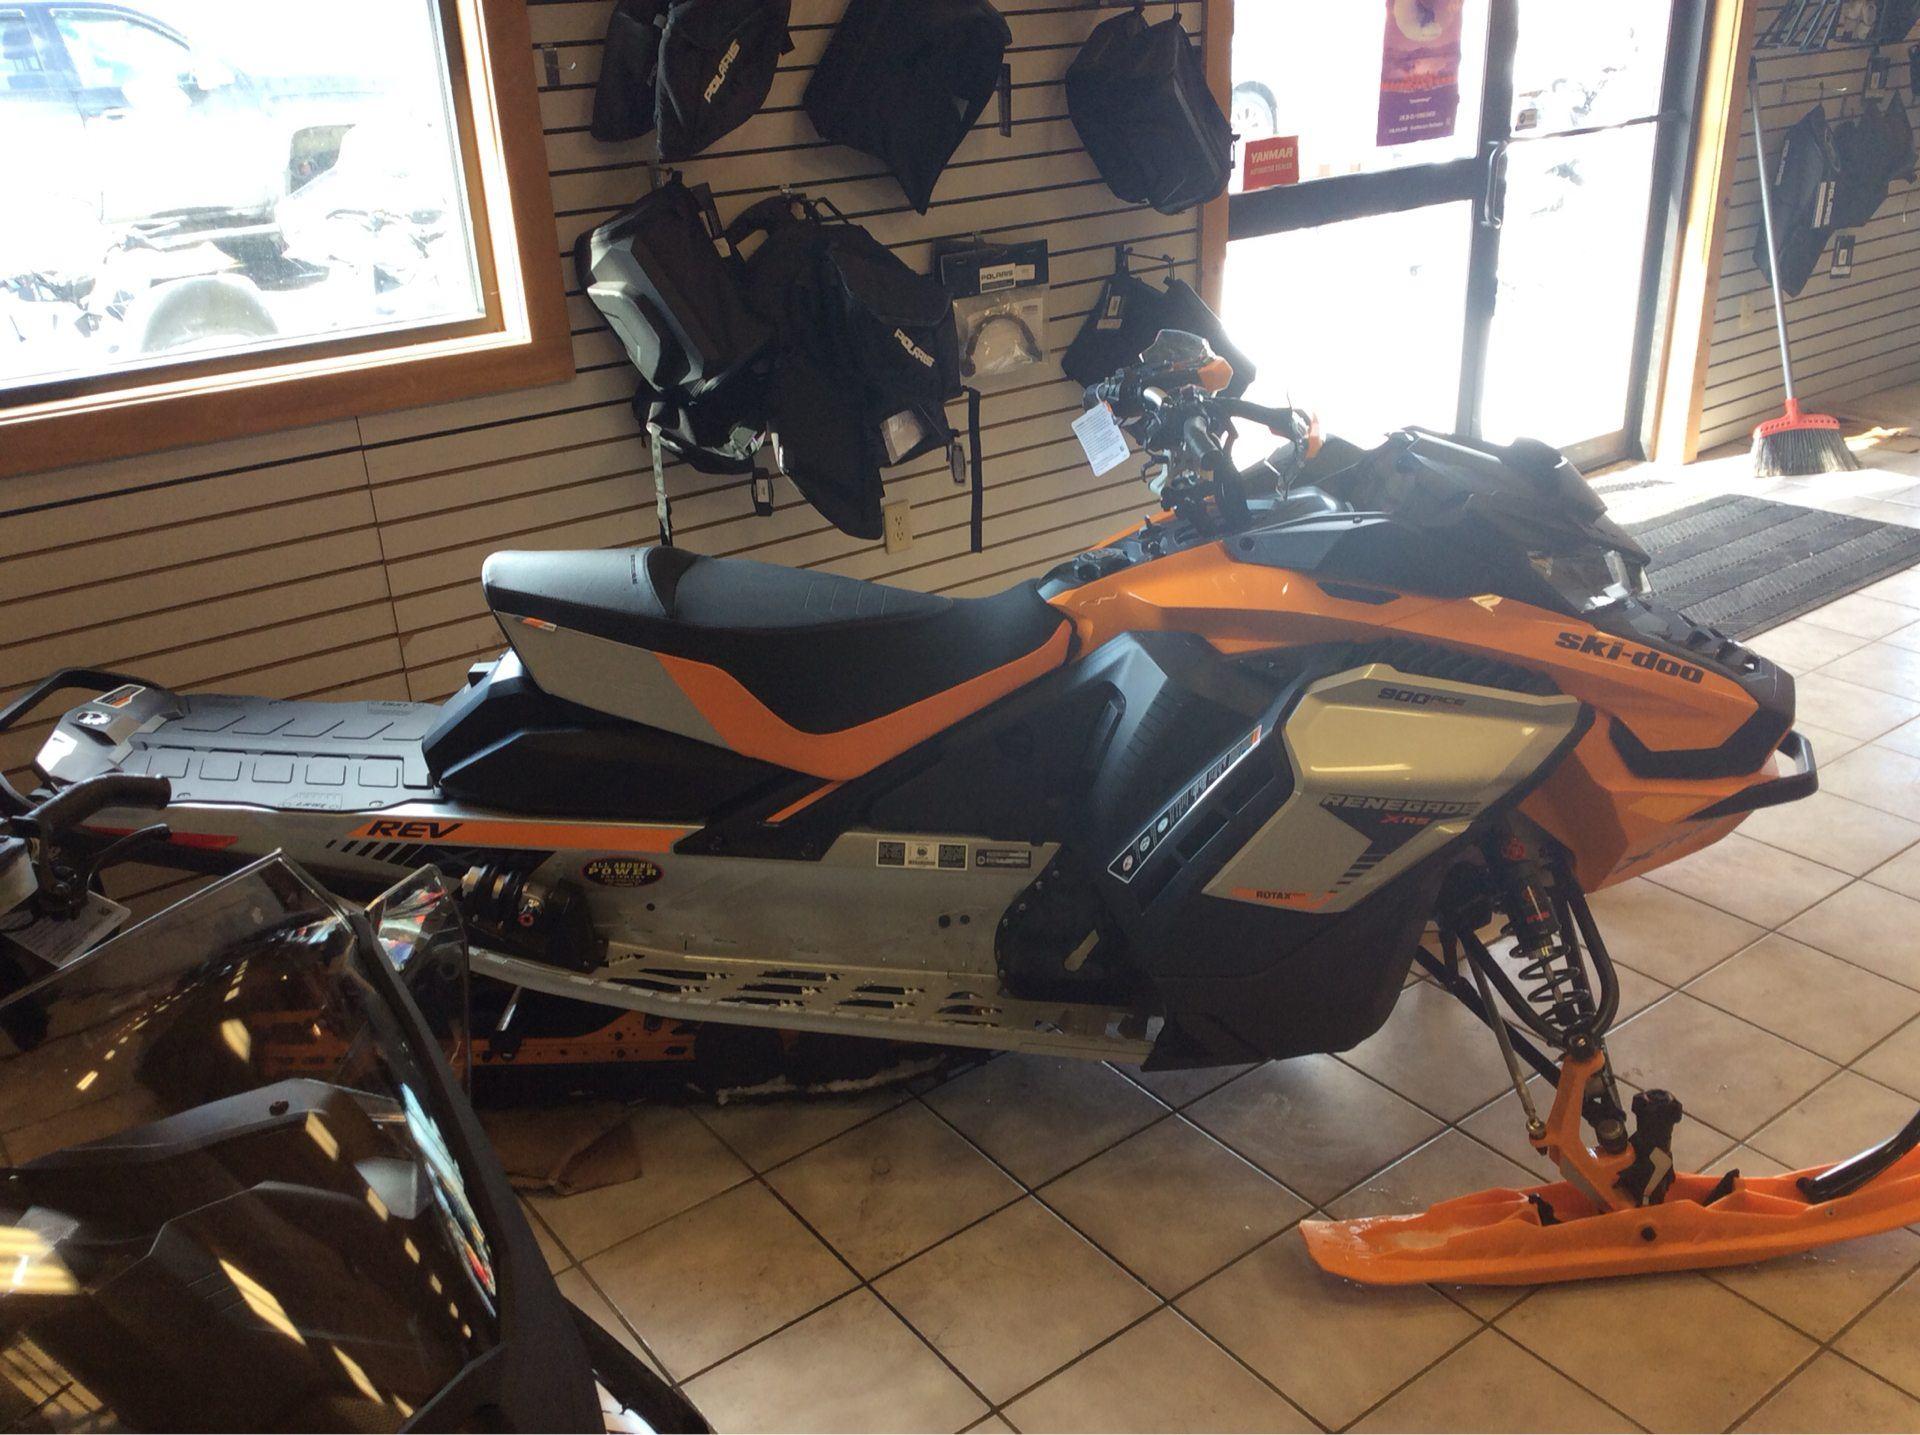 2019 Ski-Doo Renegade X-RS 900 ACE Turbo Ice Ripper XT 1 25 w/Adj  Pkg  in  Saint Johnsbury, Vermont